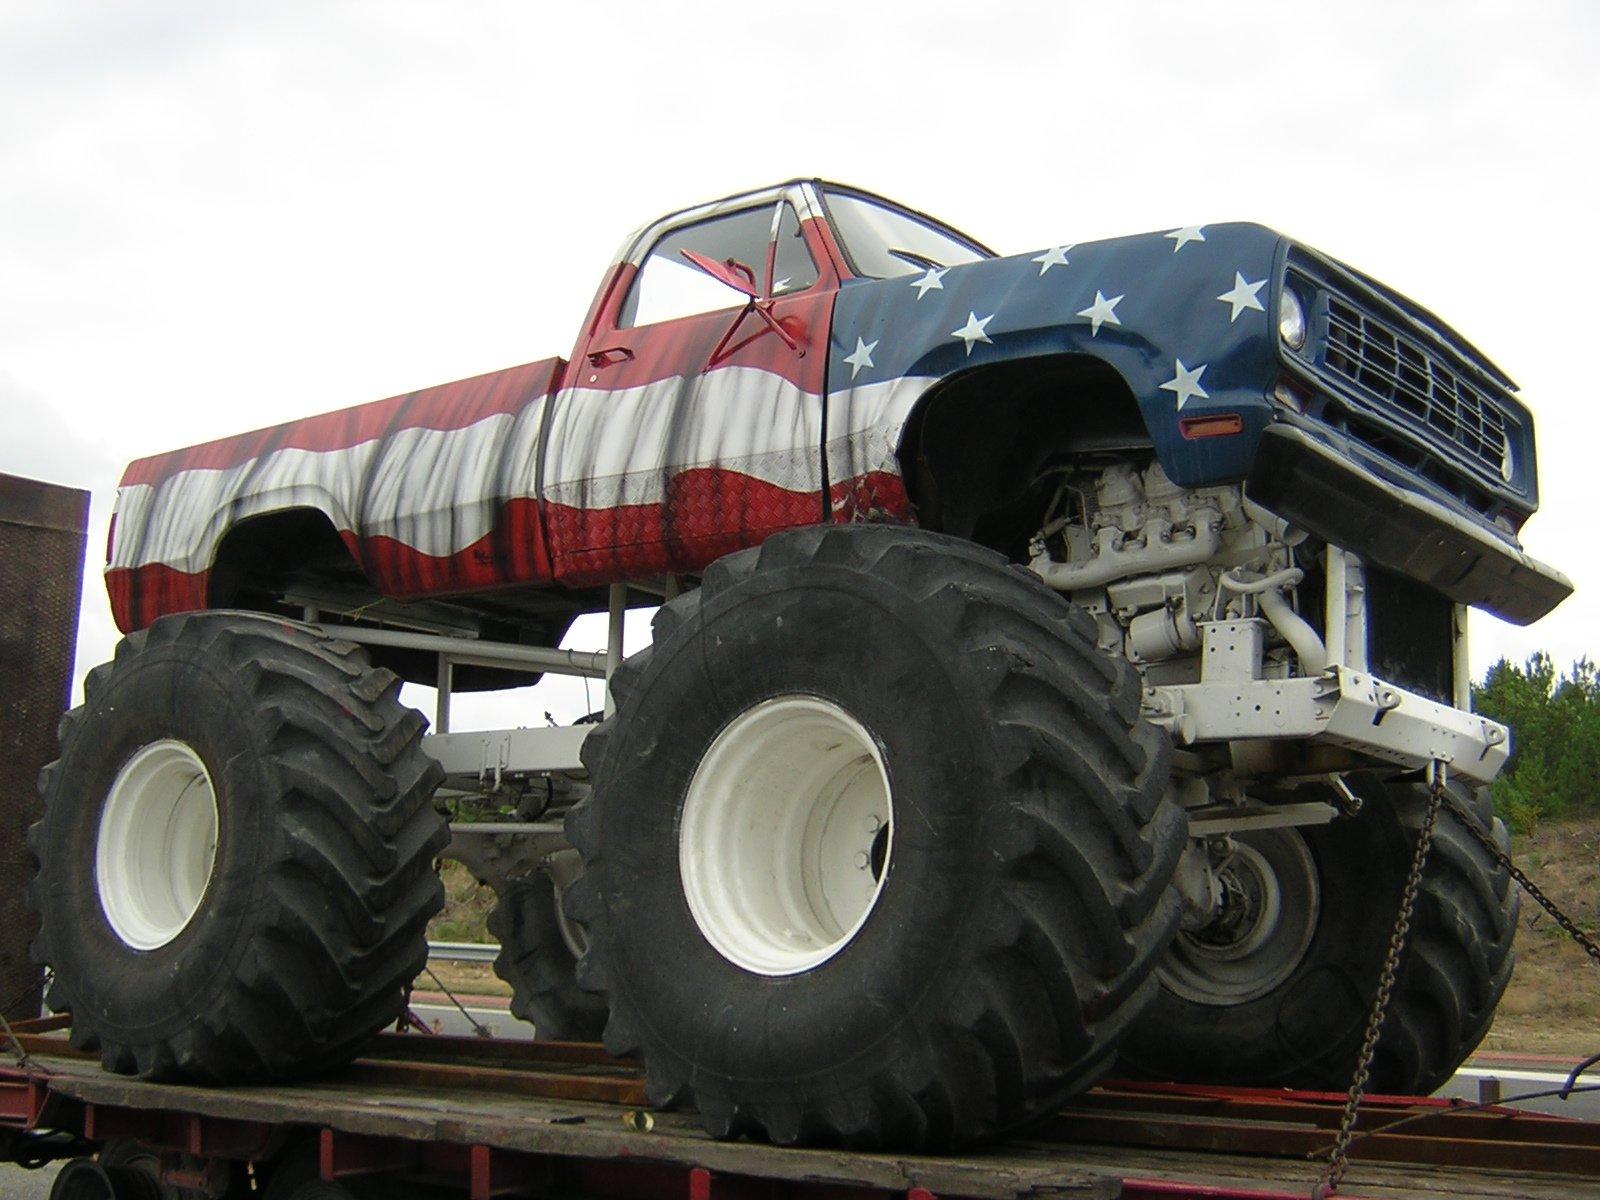 Bigfoot Cars 2